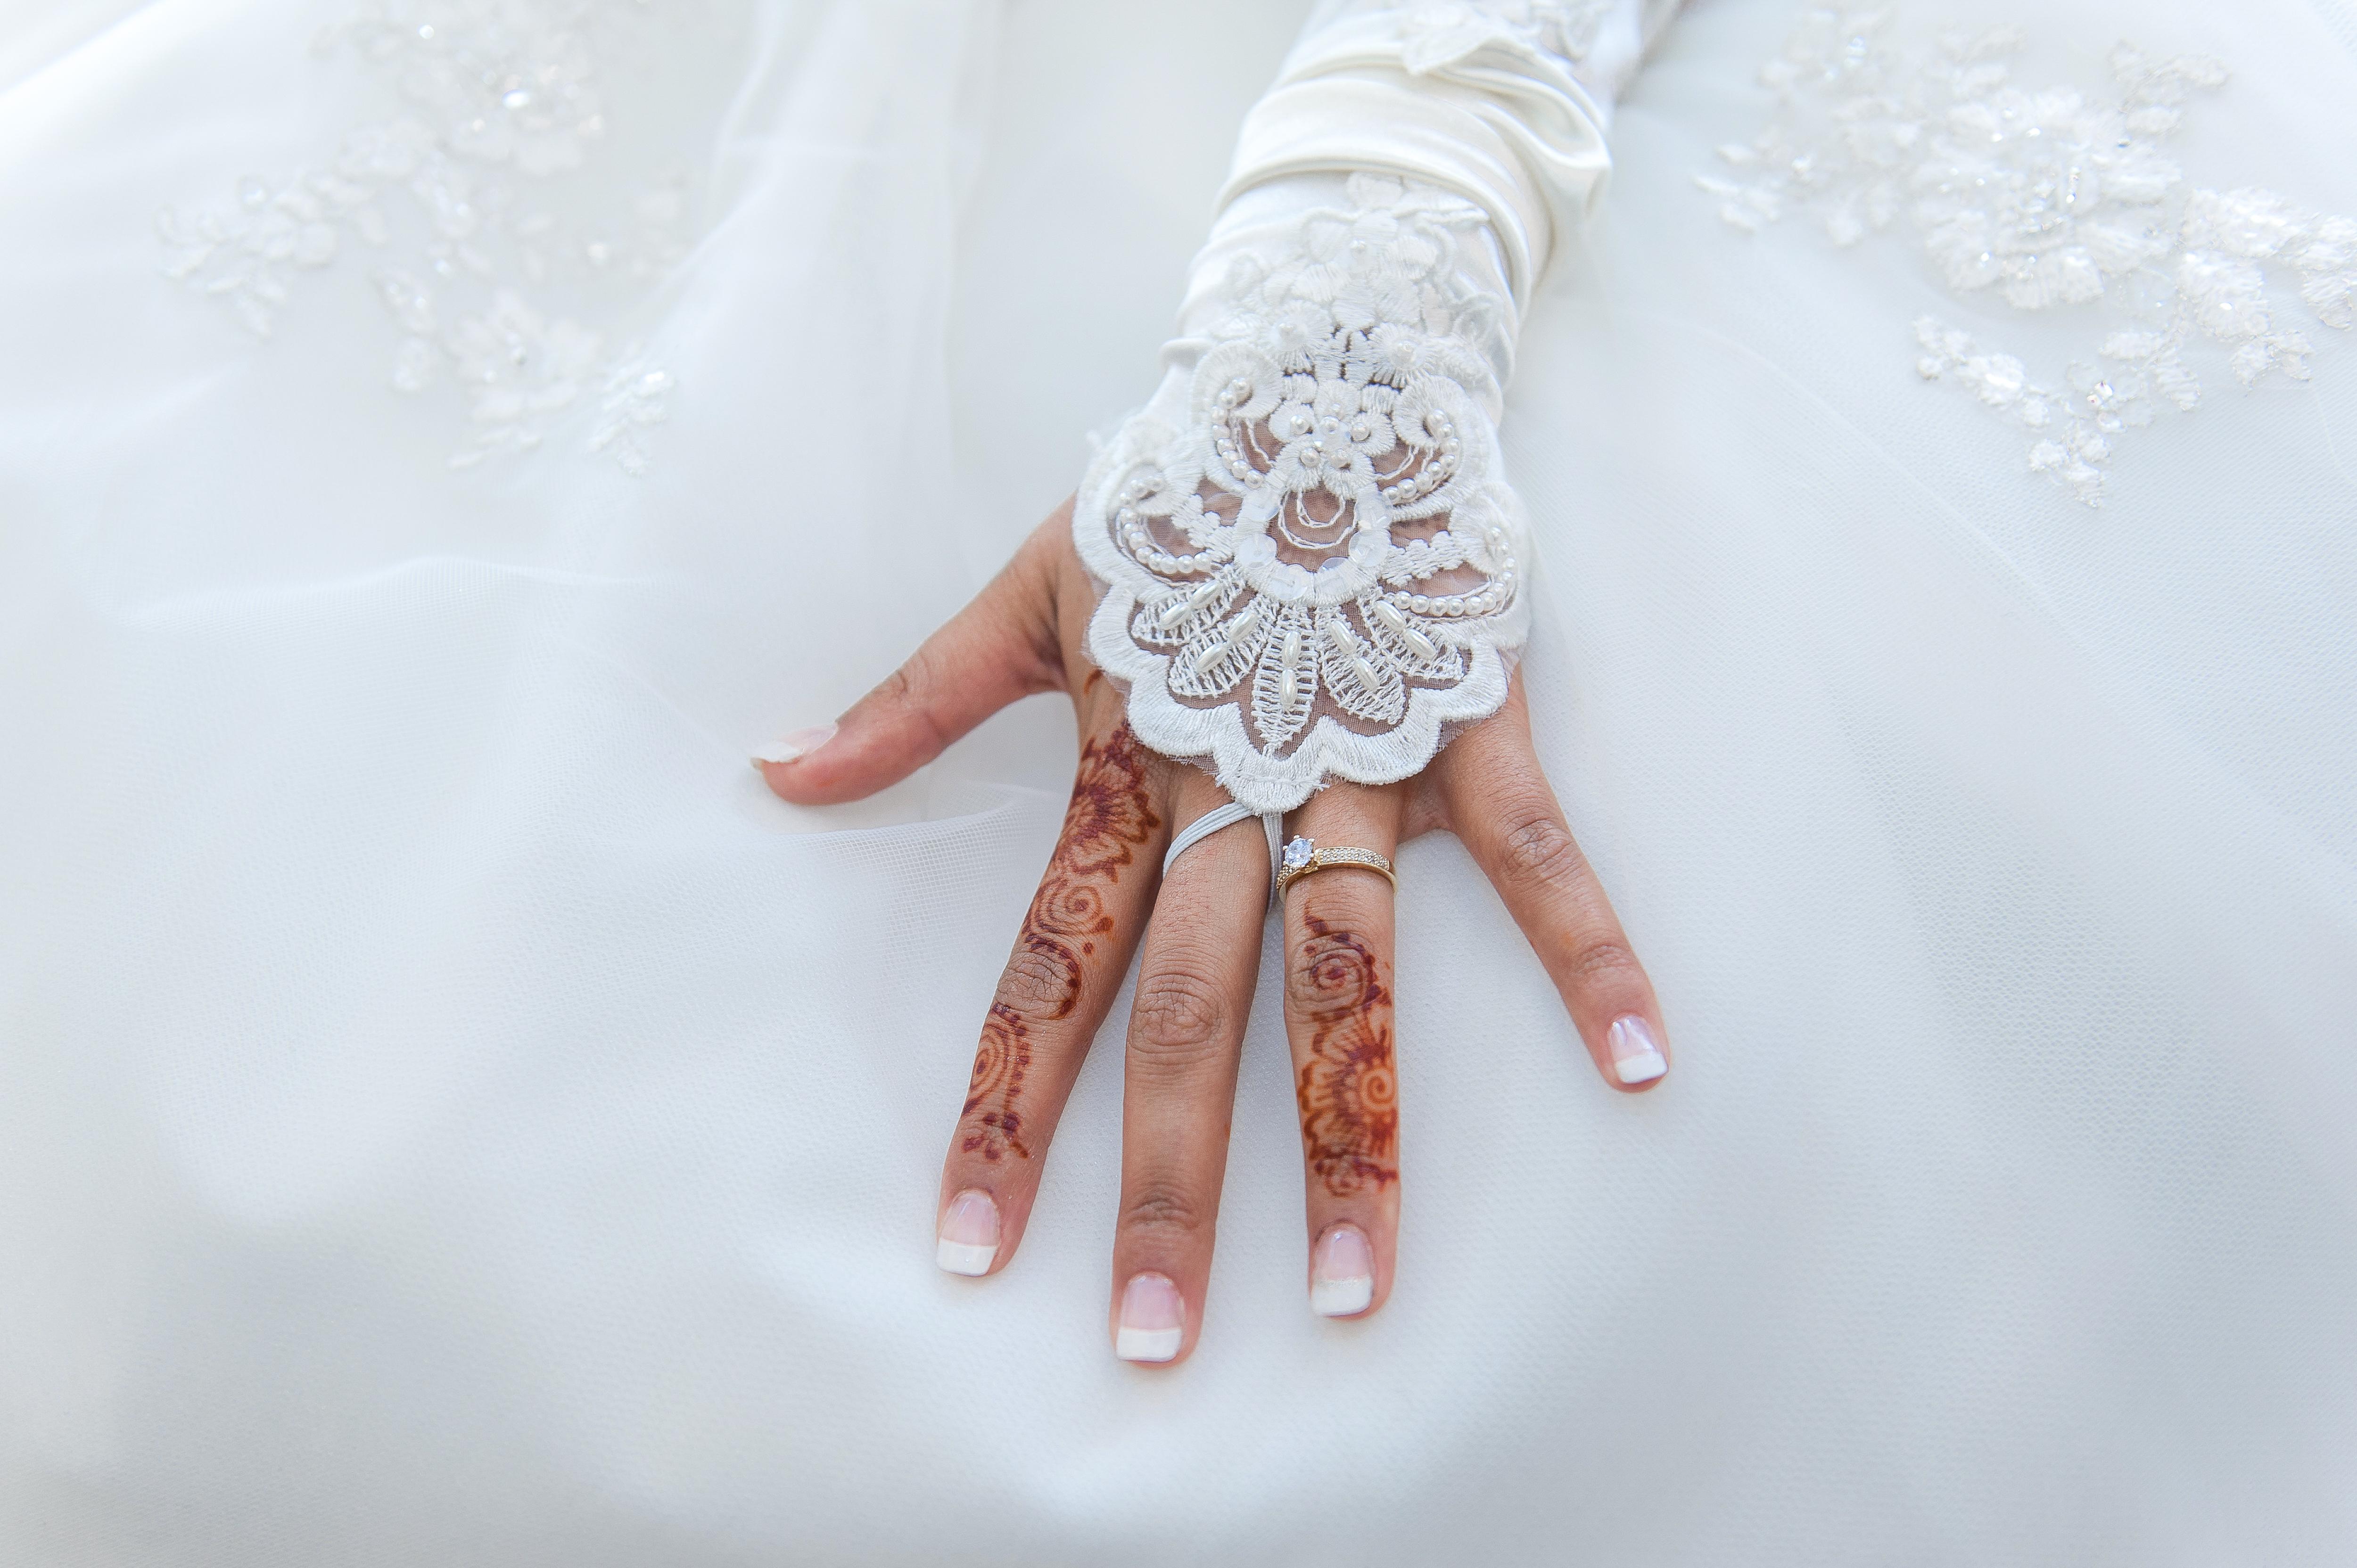 Muslim wedding hand